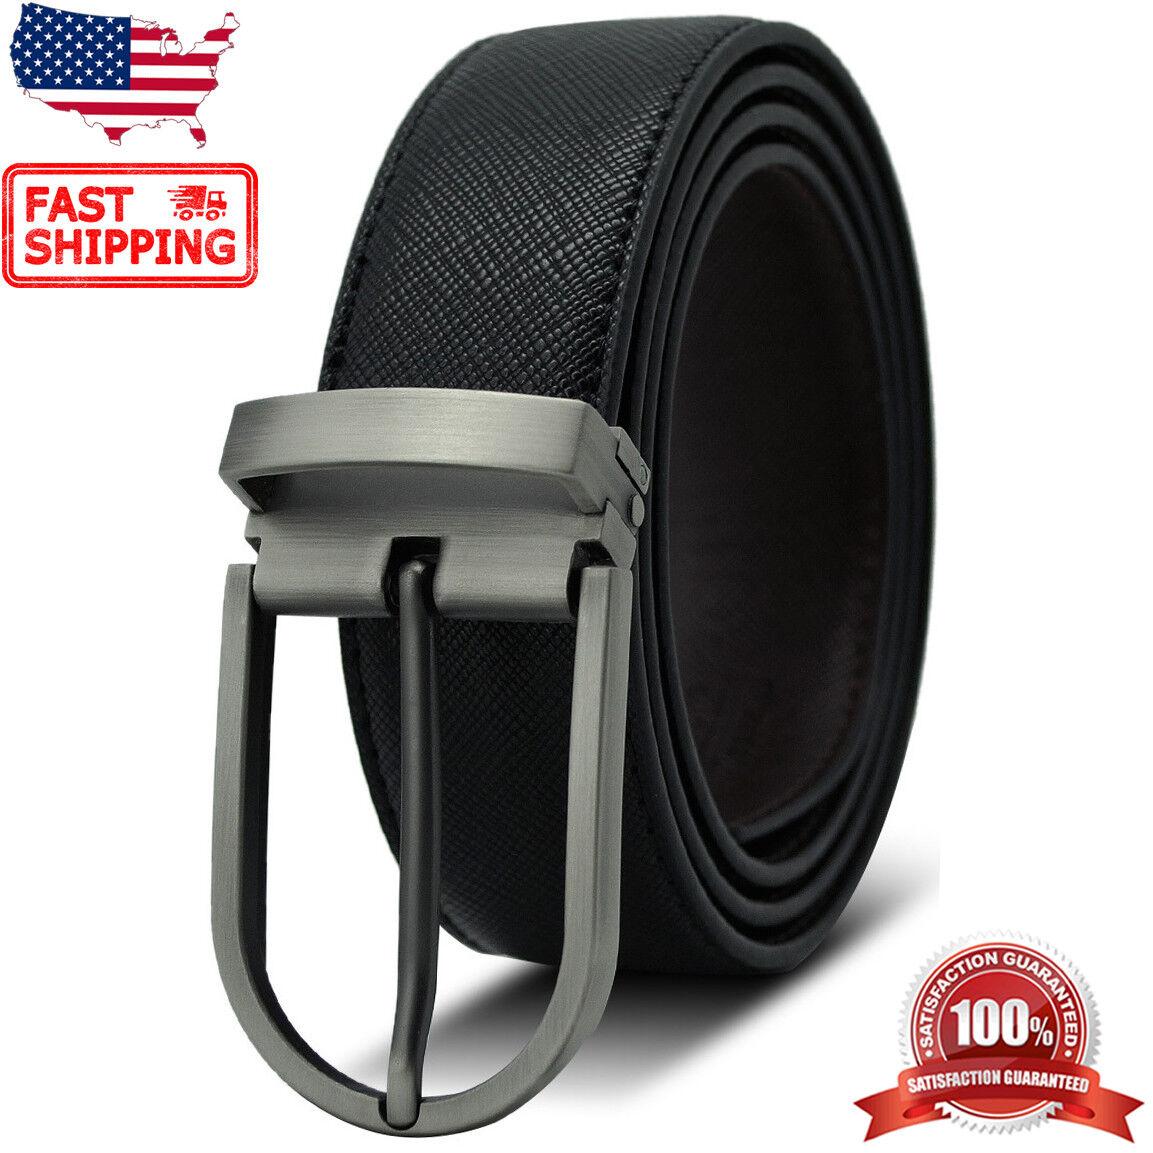 Men's Classic Metal Buckle Reversible Black & Coffee Genuine Leather Dress Belt Belts